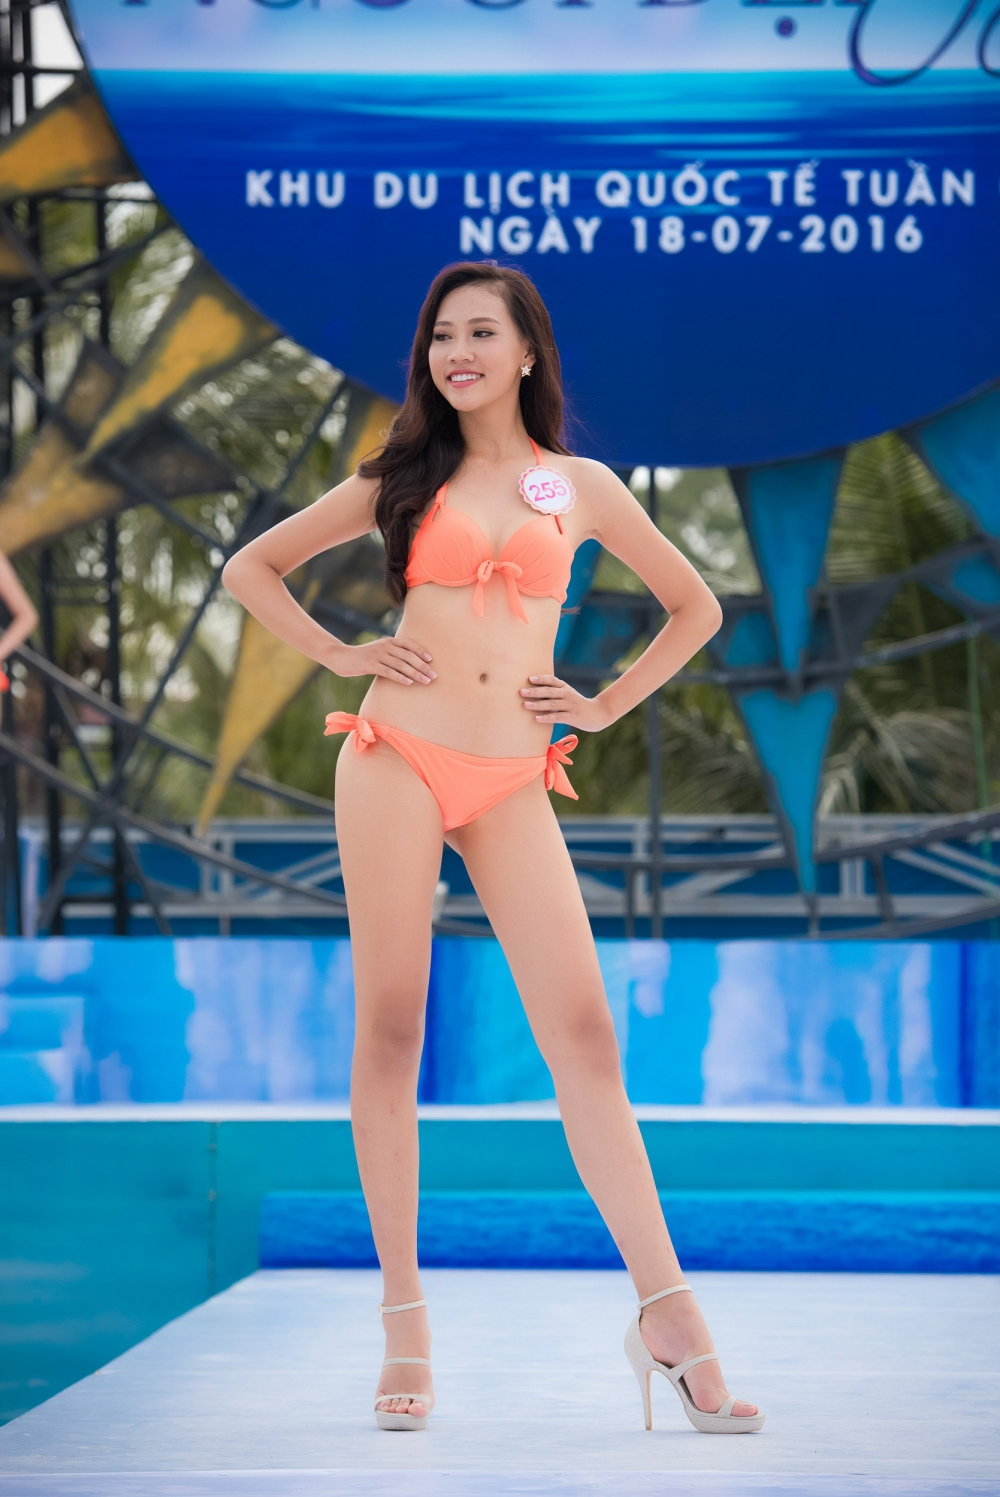 35 - Tran Thi Thuy Trang SBD 255 b